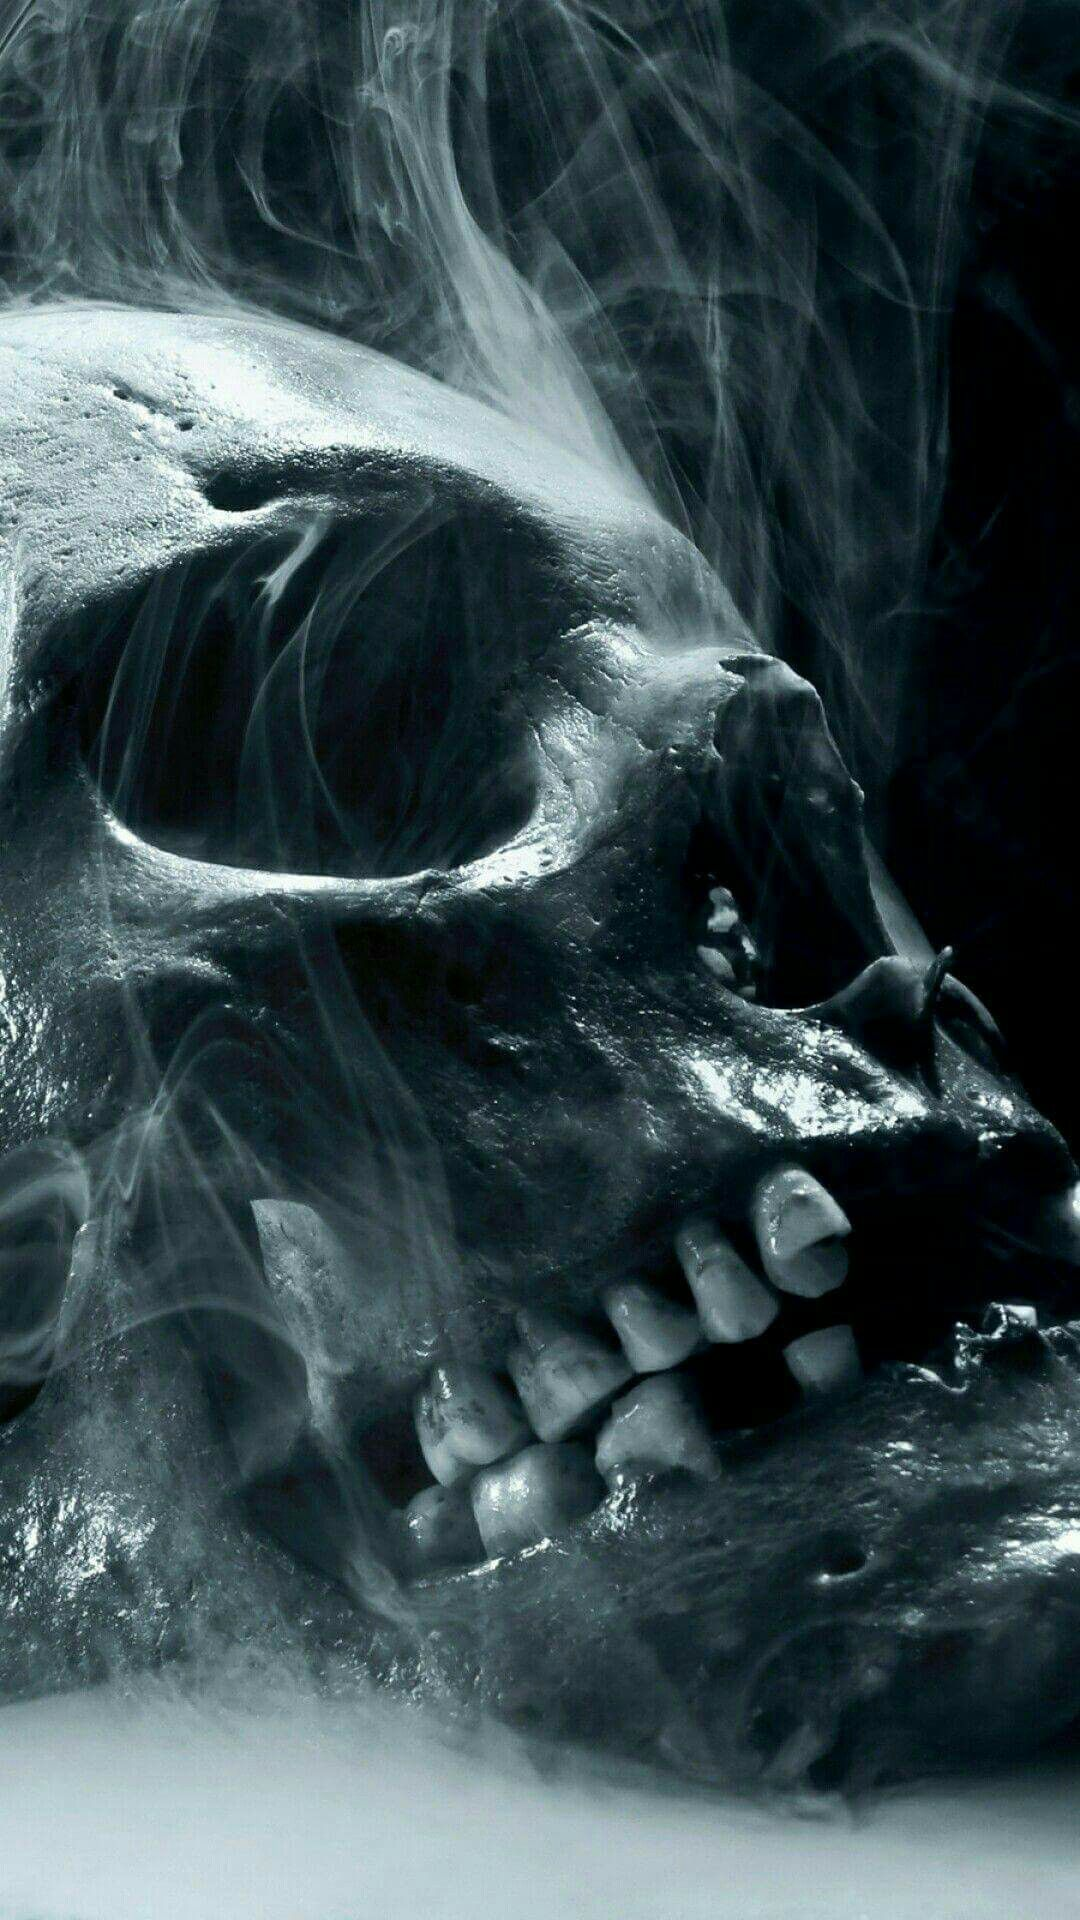 Flesh is overrated Skull wallpaper, Scary wallpaper